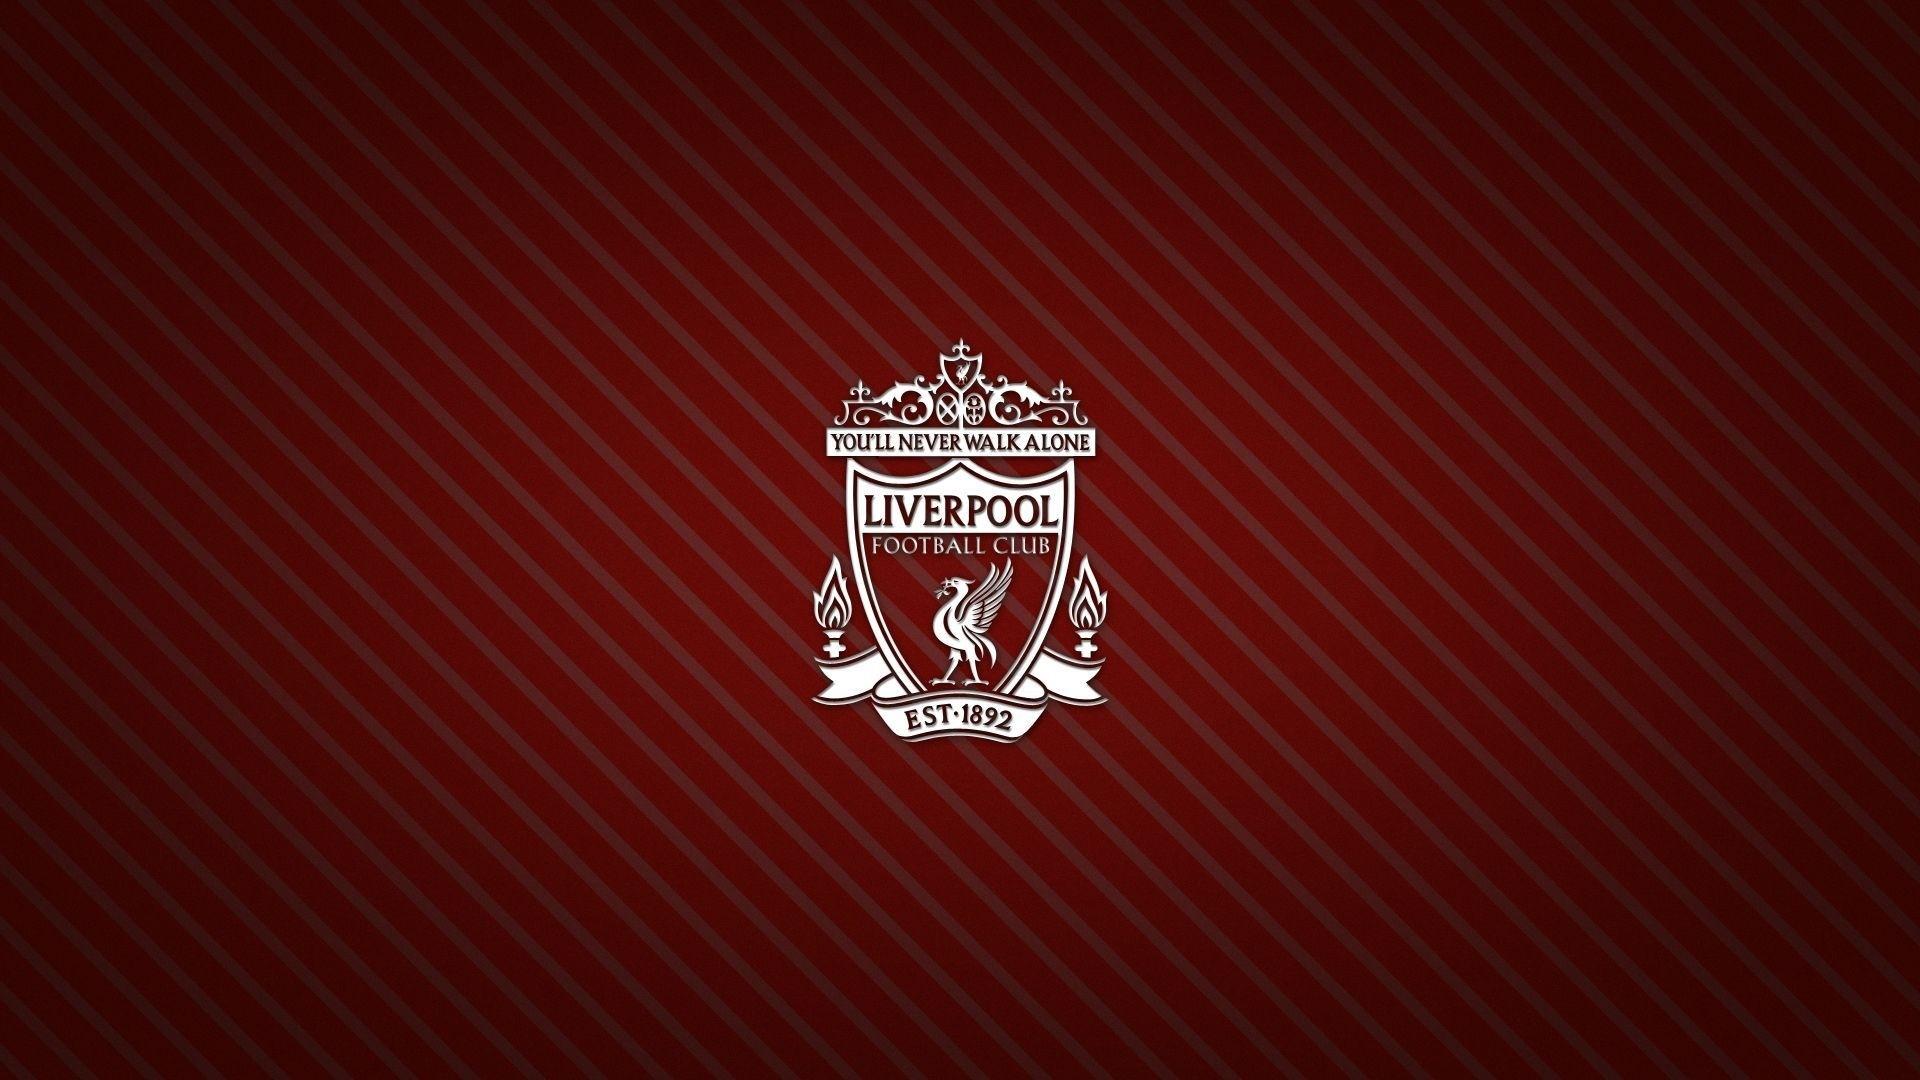 Liverpool PC Wallpaper HD